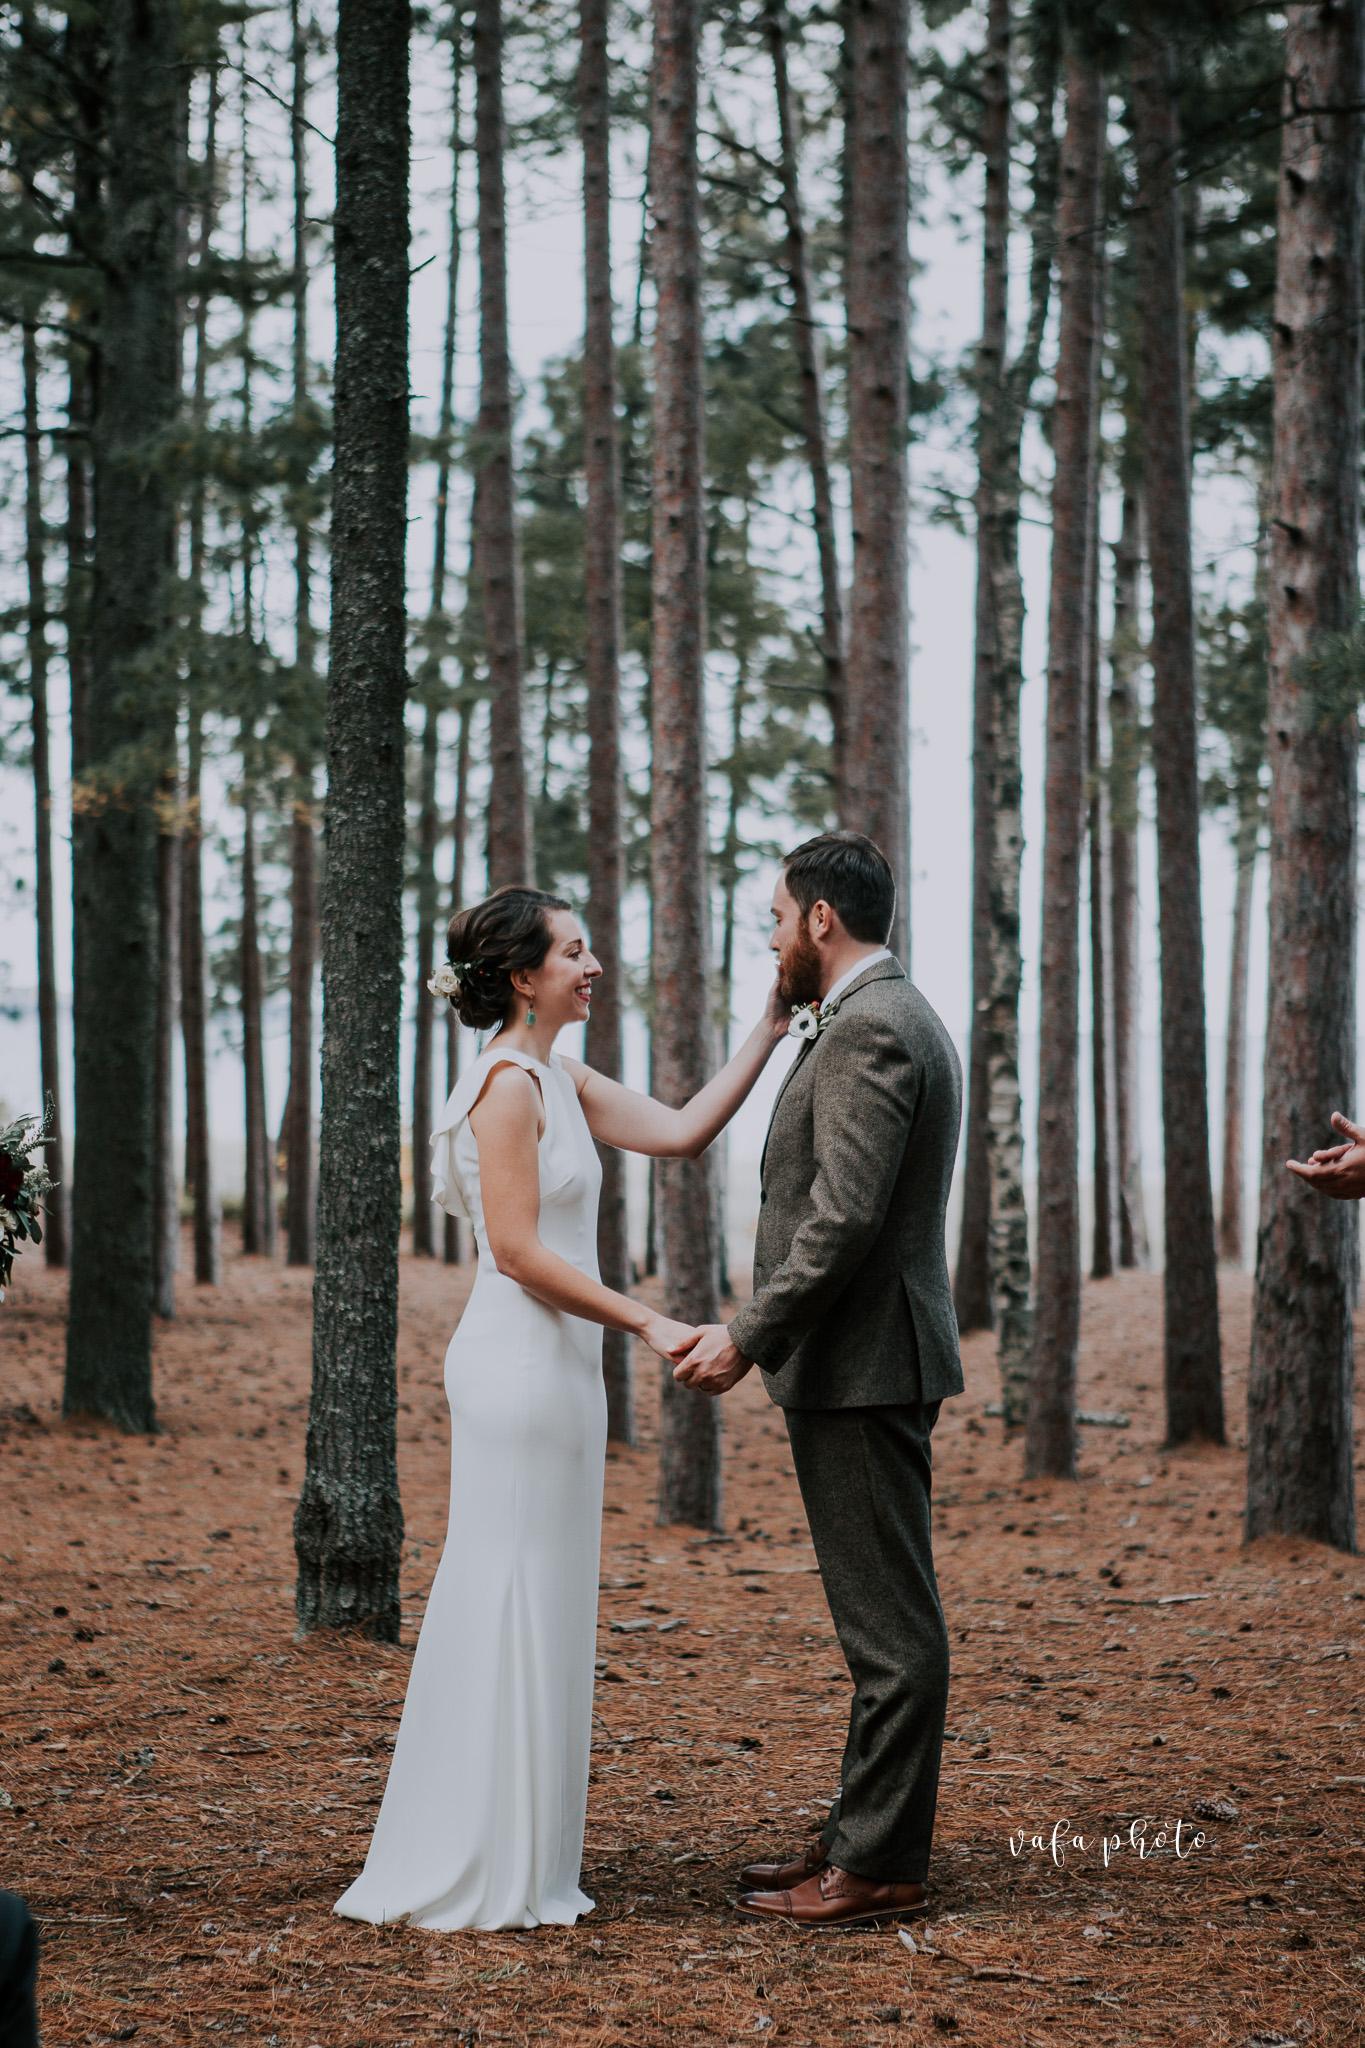 Little-Presque-Isle-Michigan-Wedding-Kim-Kyle-Vafa-Photo-260.jpg